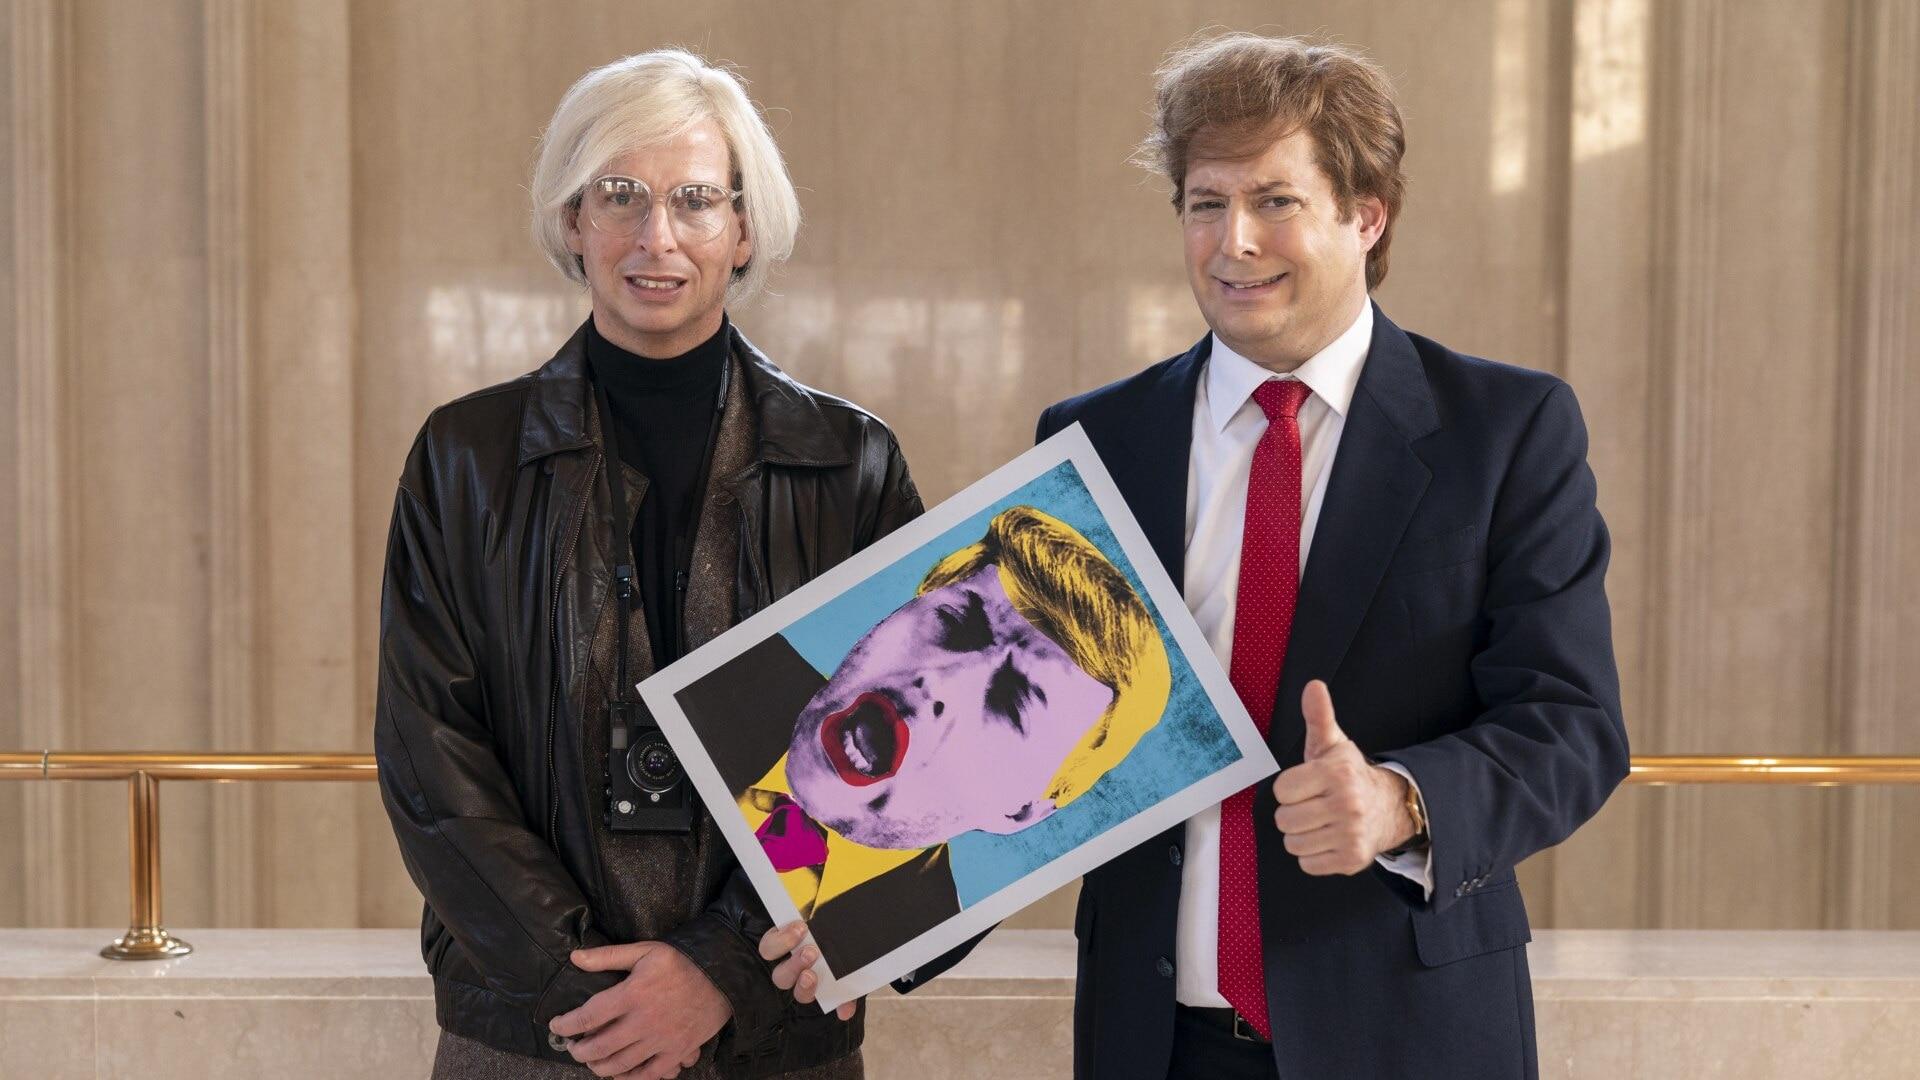 Donald Trump And Andy Warhol